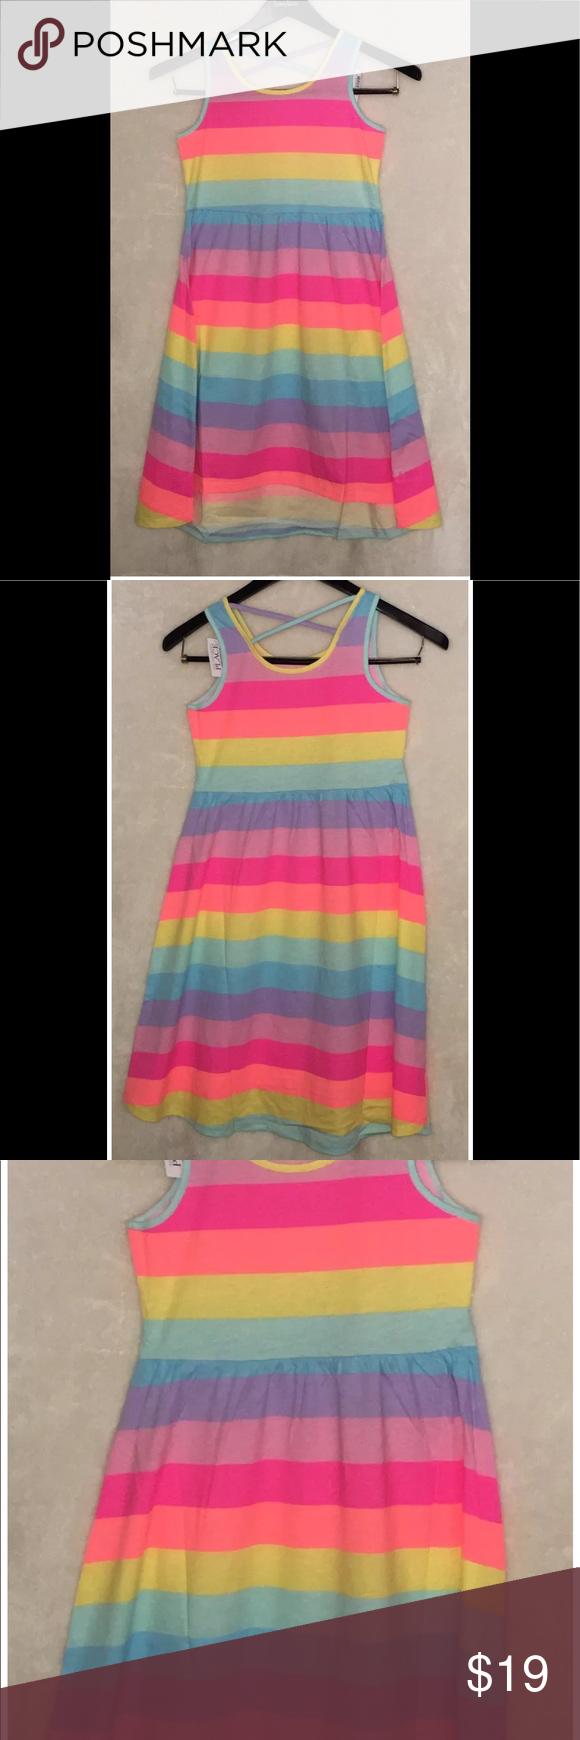 c06eba10f87a Children's Place Girls Rainbow Stripe Cross-Back Brand new Children's Place  Girls Sleeveless Rainbow Stripe Cross-Back Hi-Low Maxi Dress Size XL (14).